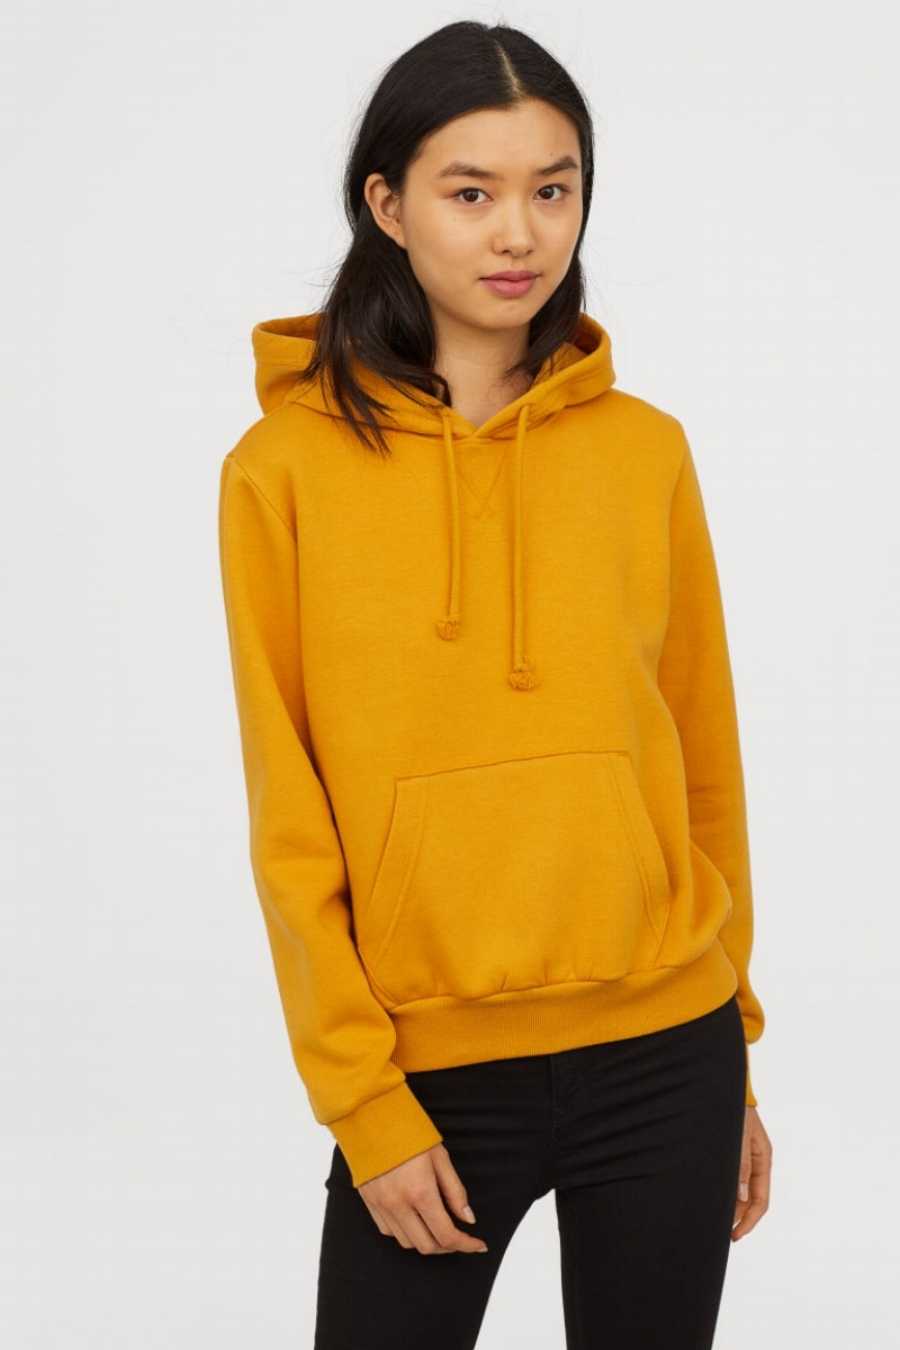 SS19 Trends- Bold Hues Mustard Sweatshirt